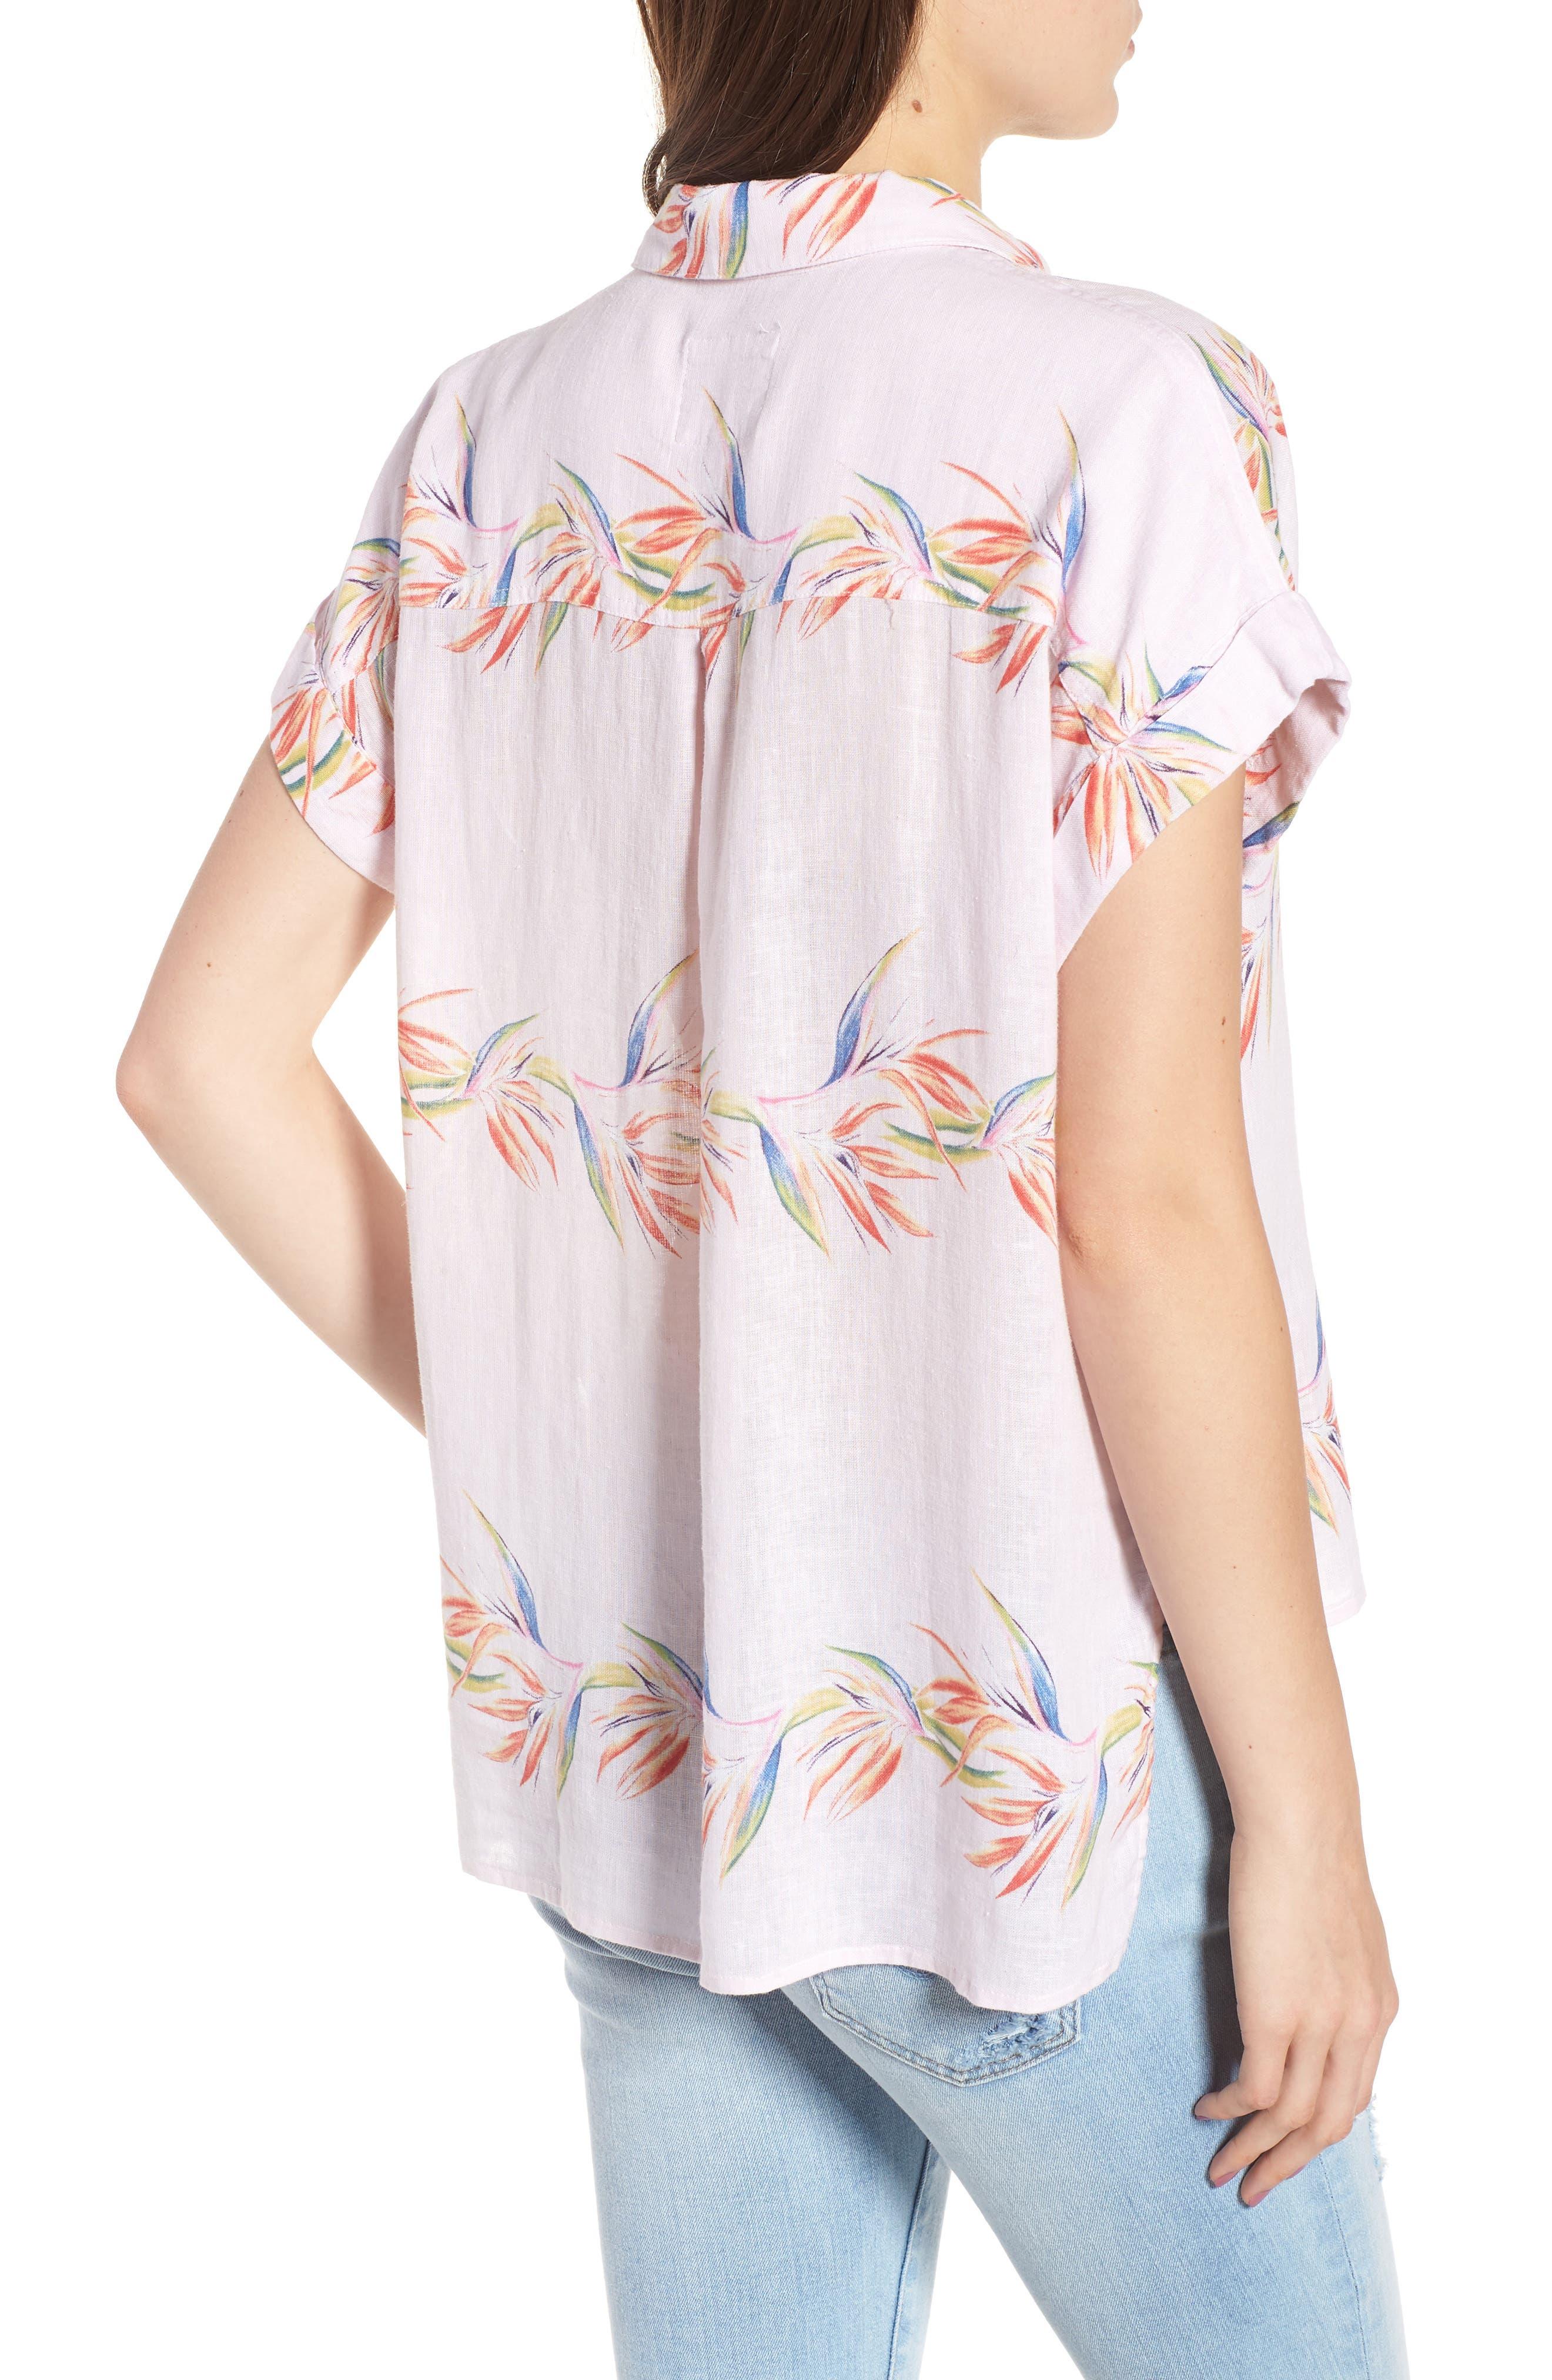 Whitney Print Shirt,                             Alternate thumbnail 2, color,                             Blush Birds Of Paradise